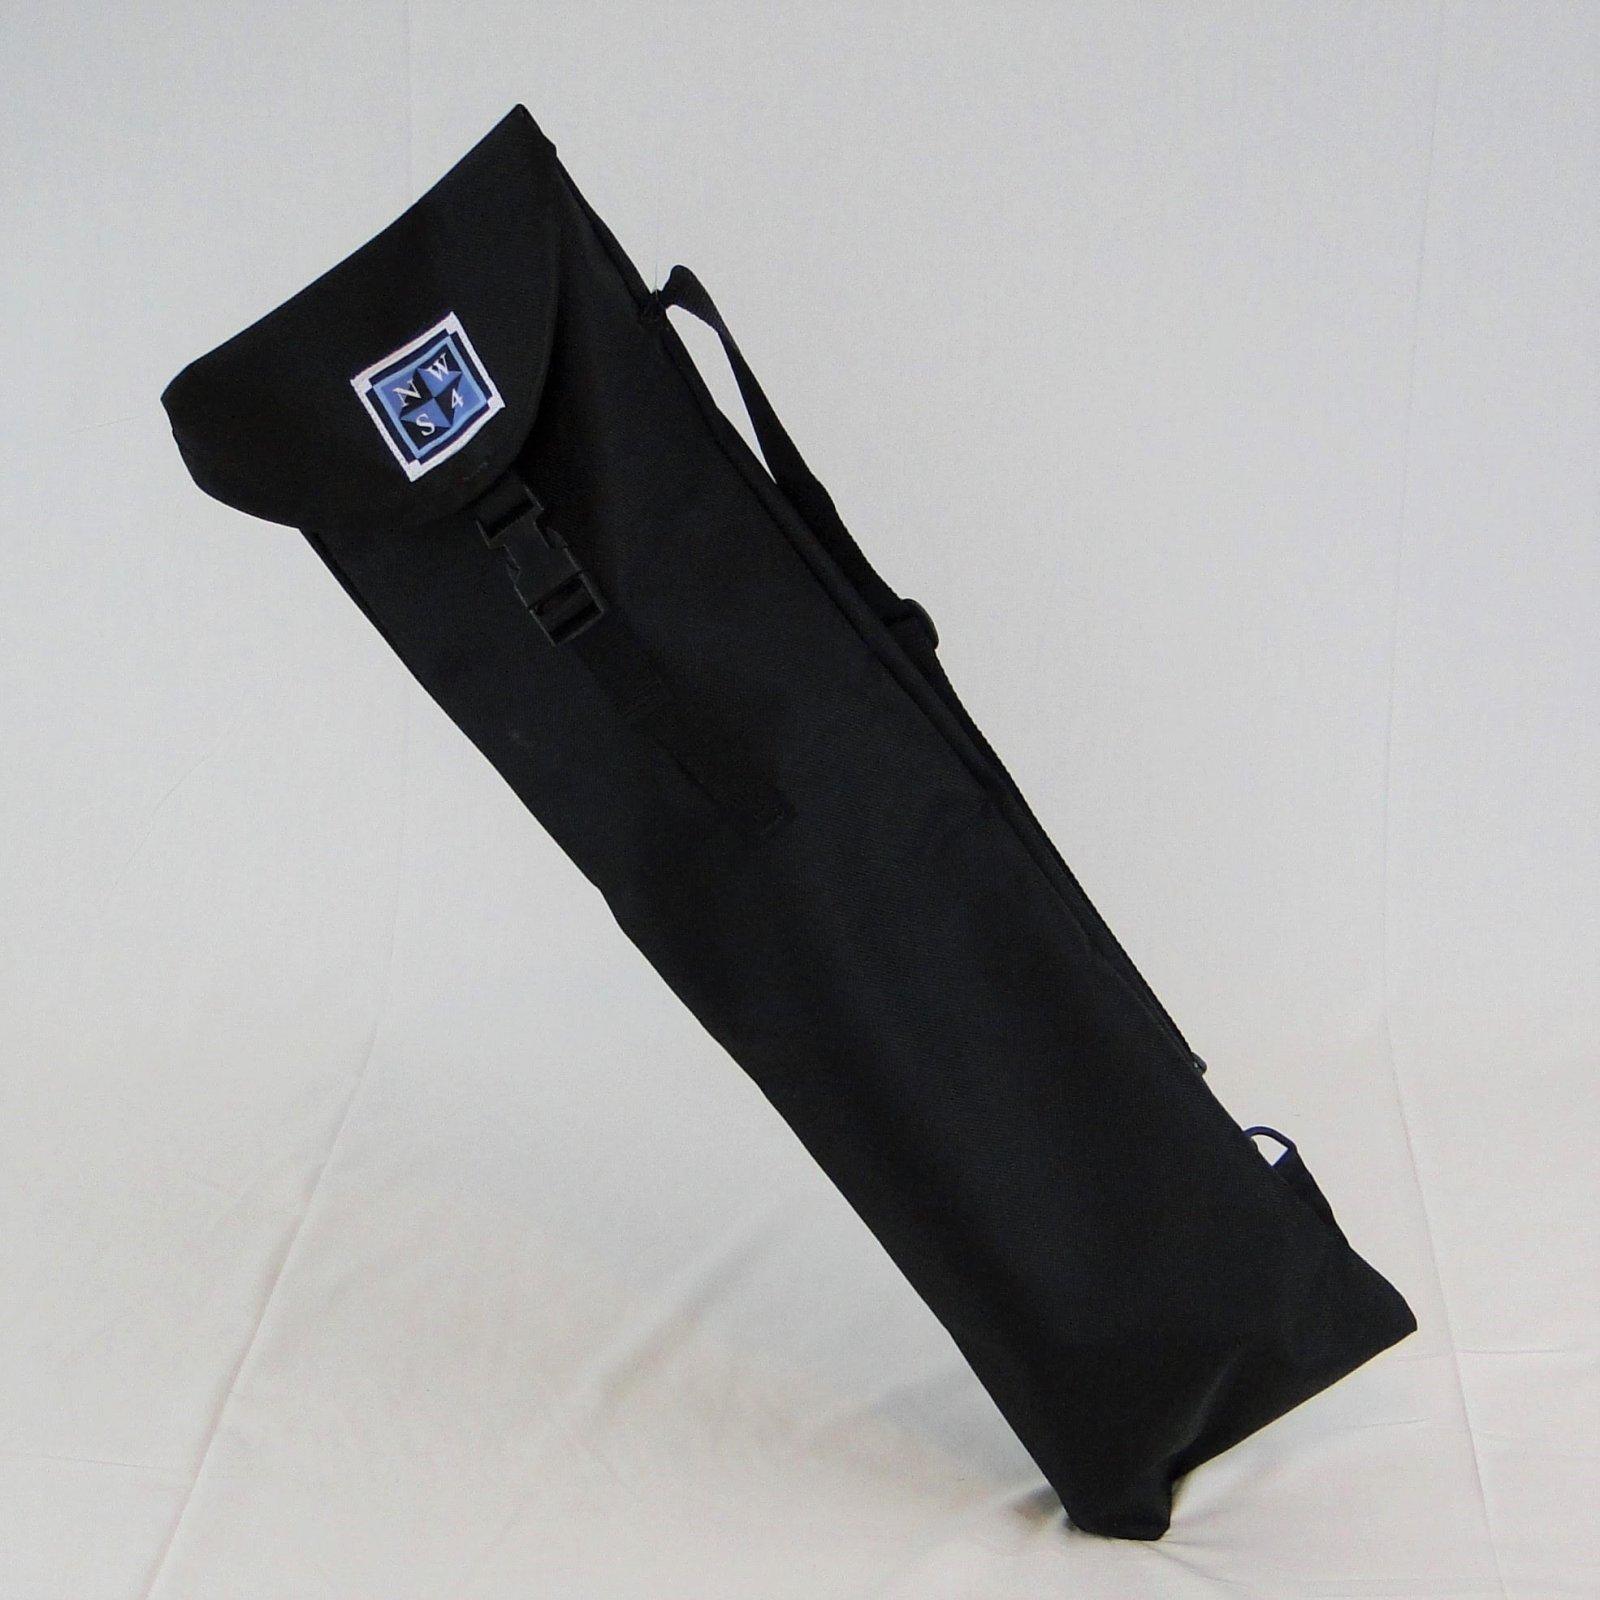 Needlework System 4 Travel Mate Carry Bag